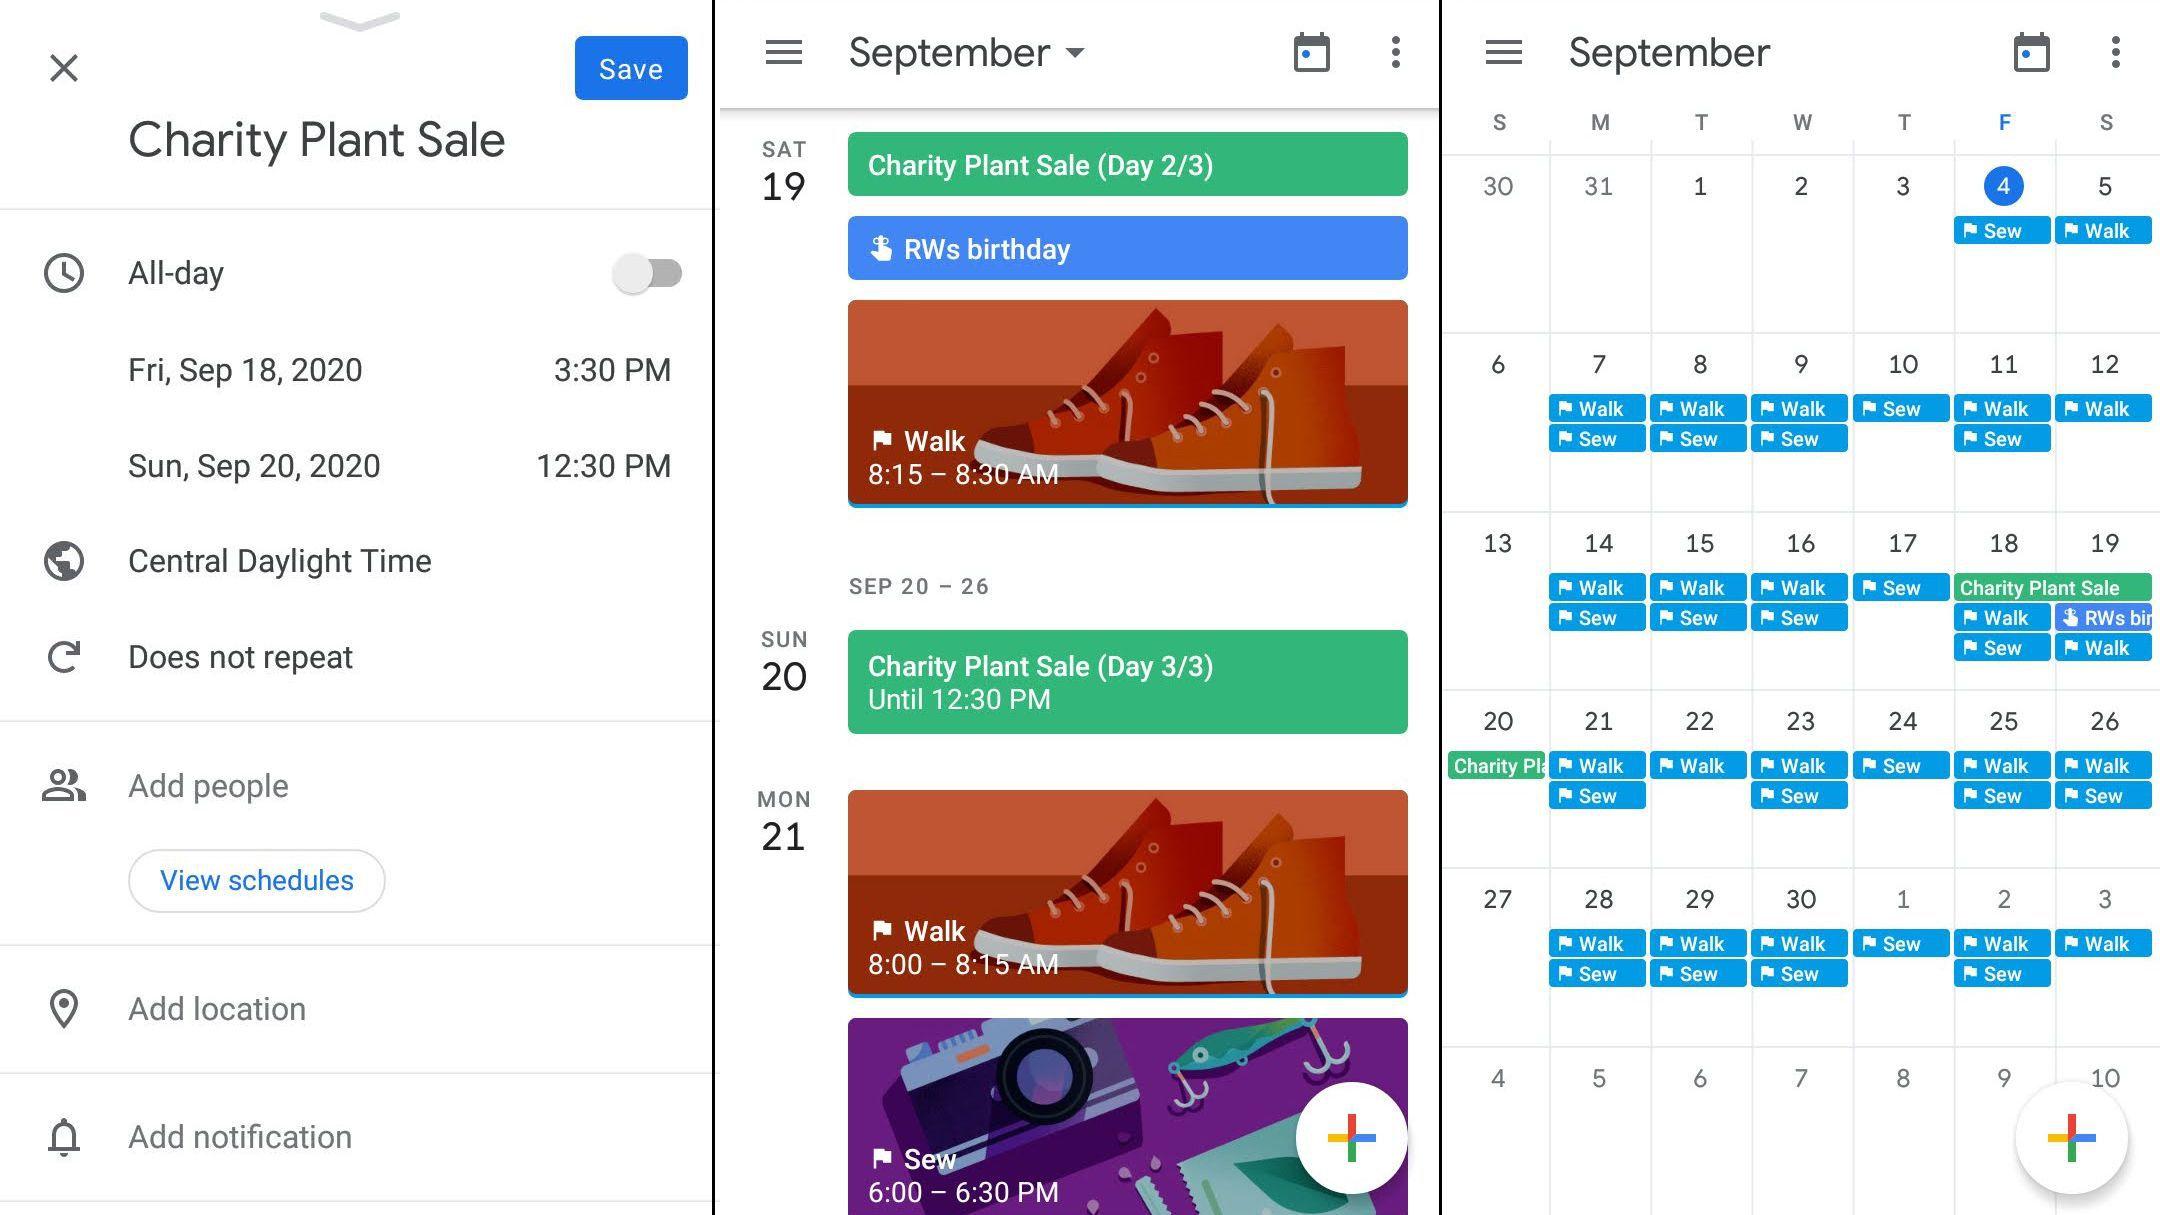 002 Shocking Editable Calendar Google Doc 2021 High Resolution Full